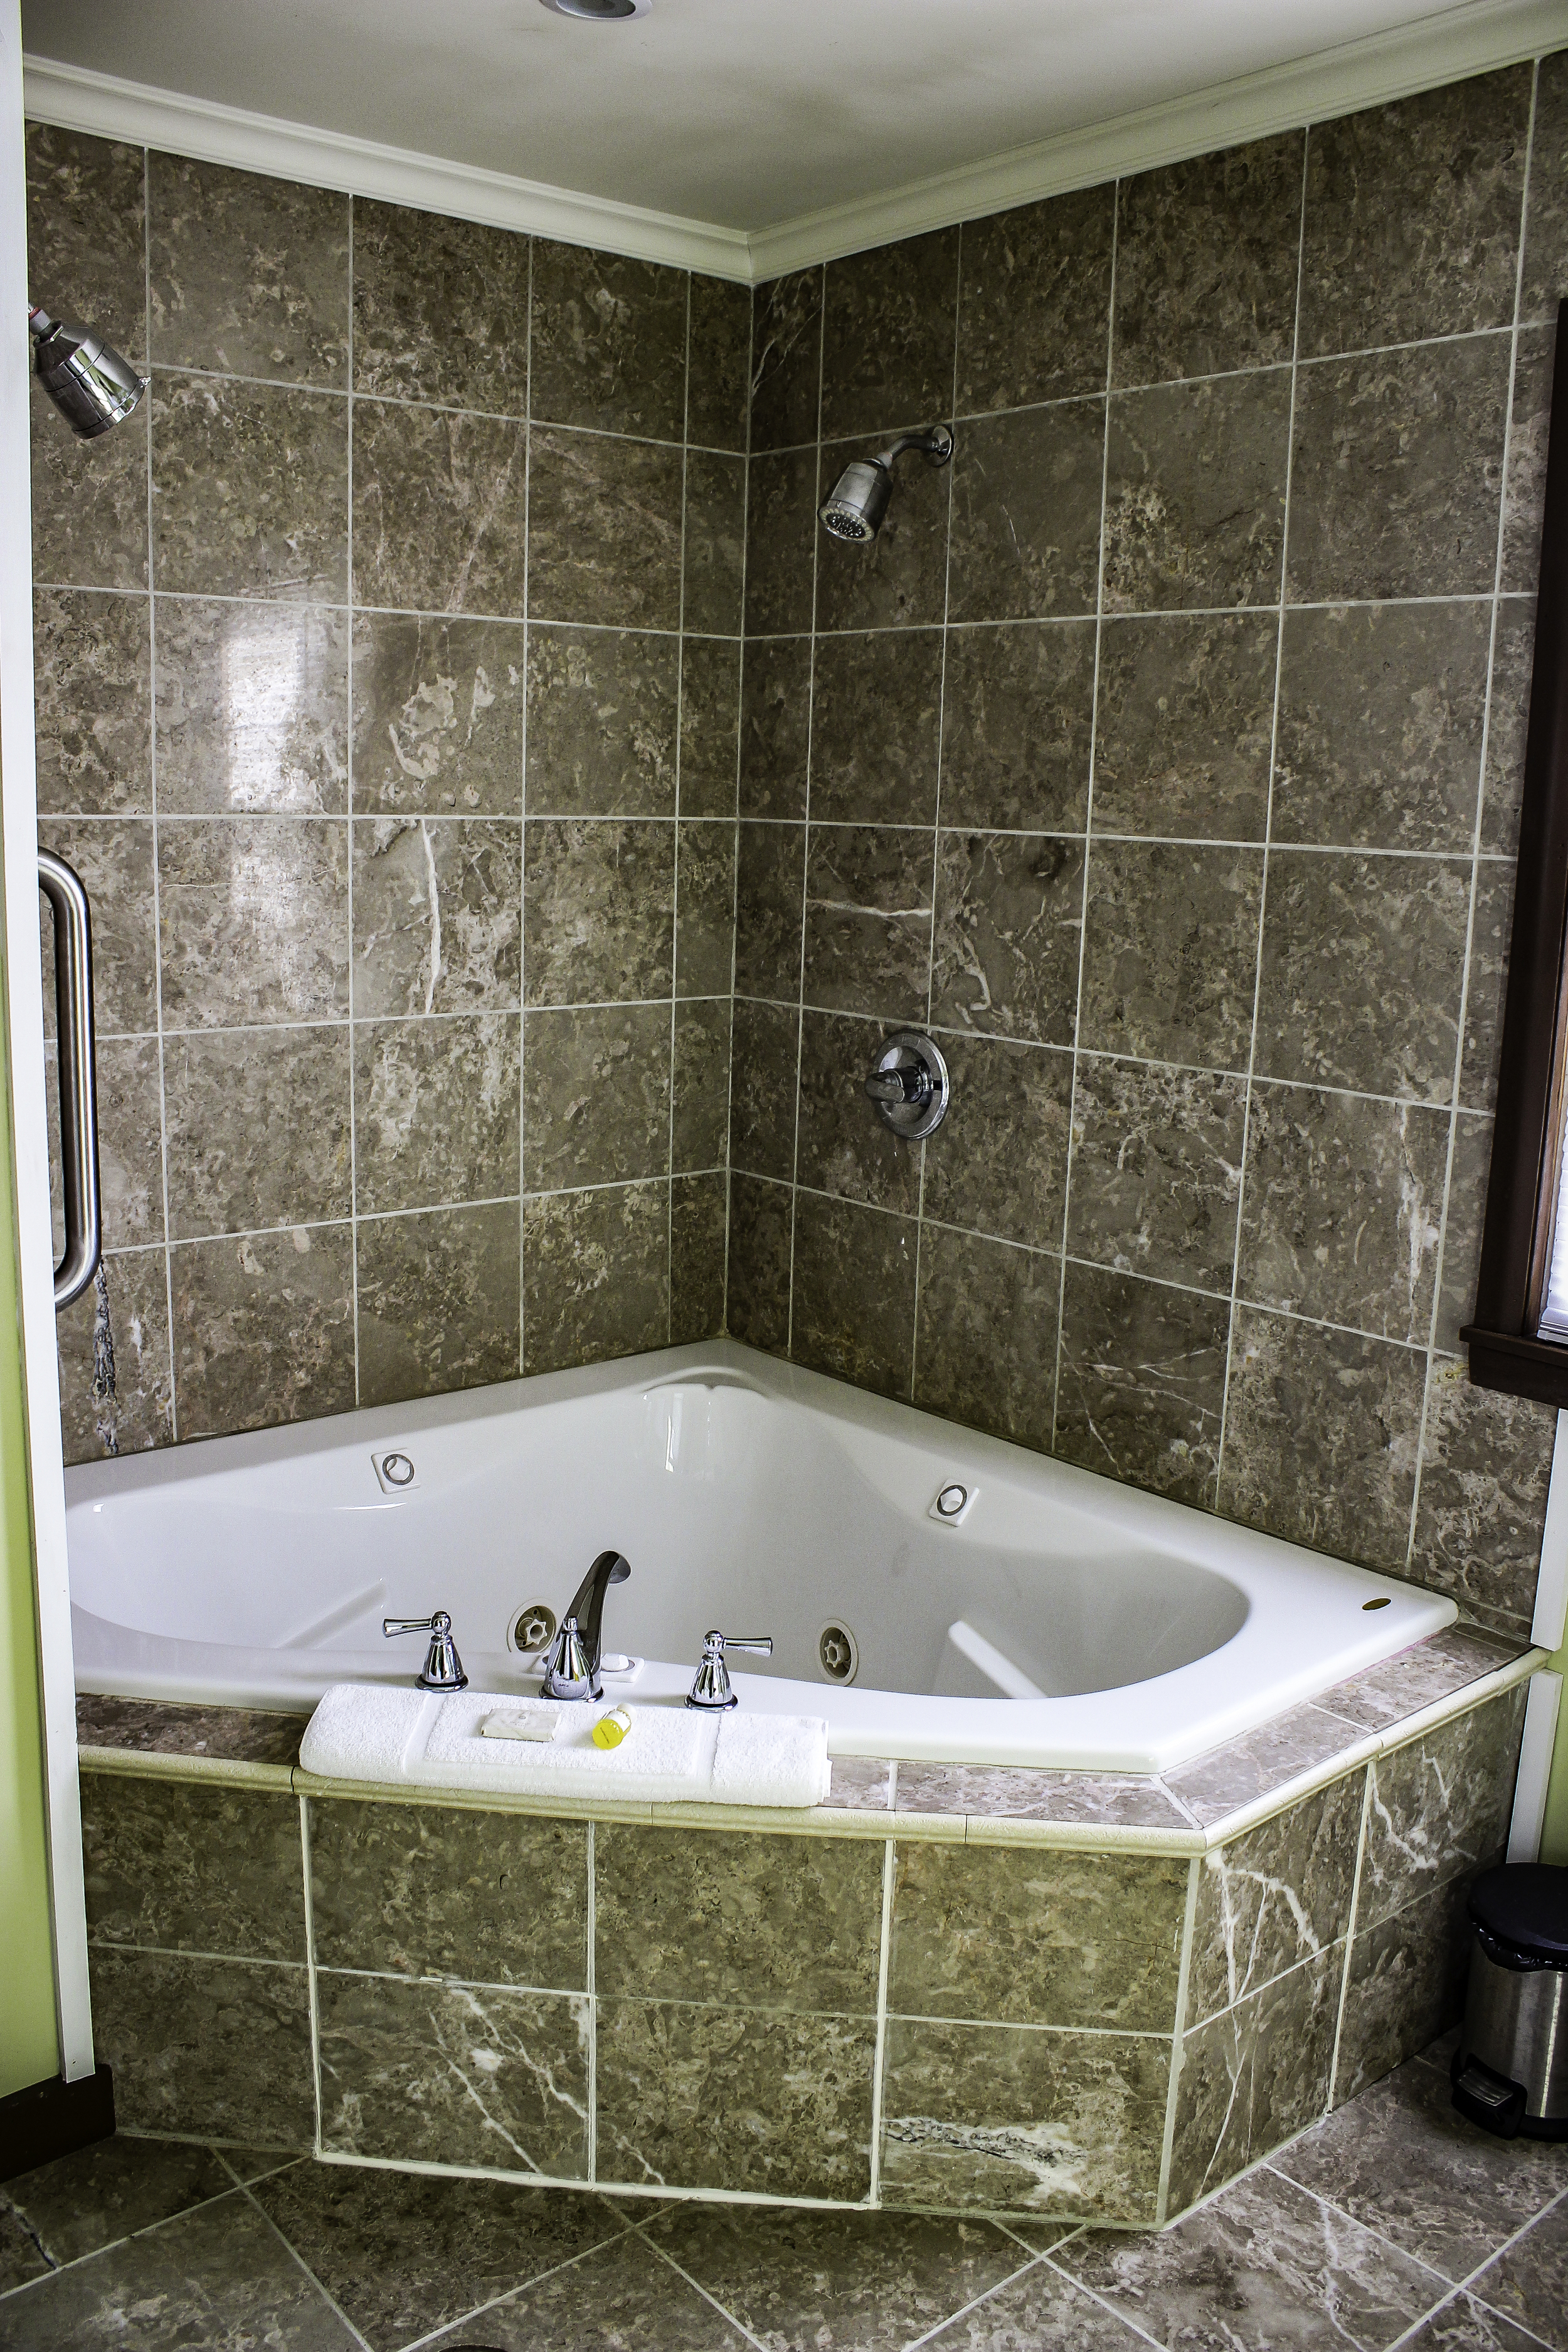 20130610-White Oak Port Jacuzzi tub.JPG